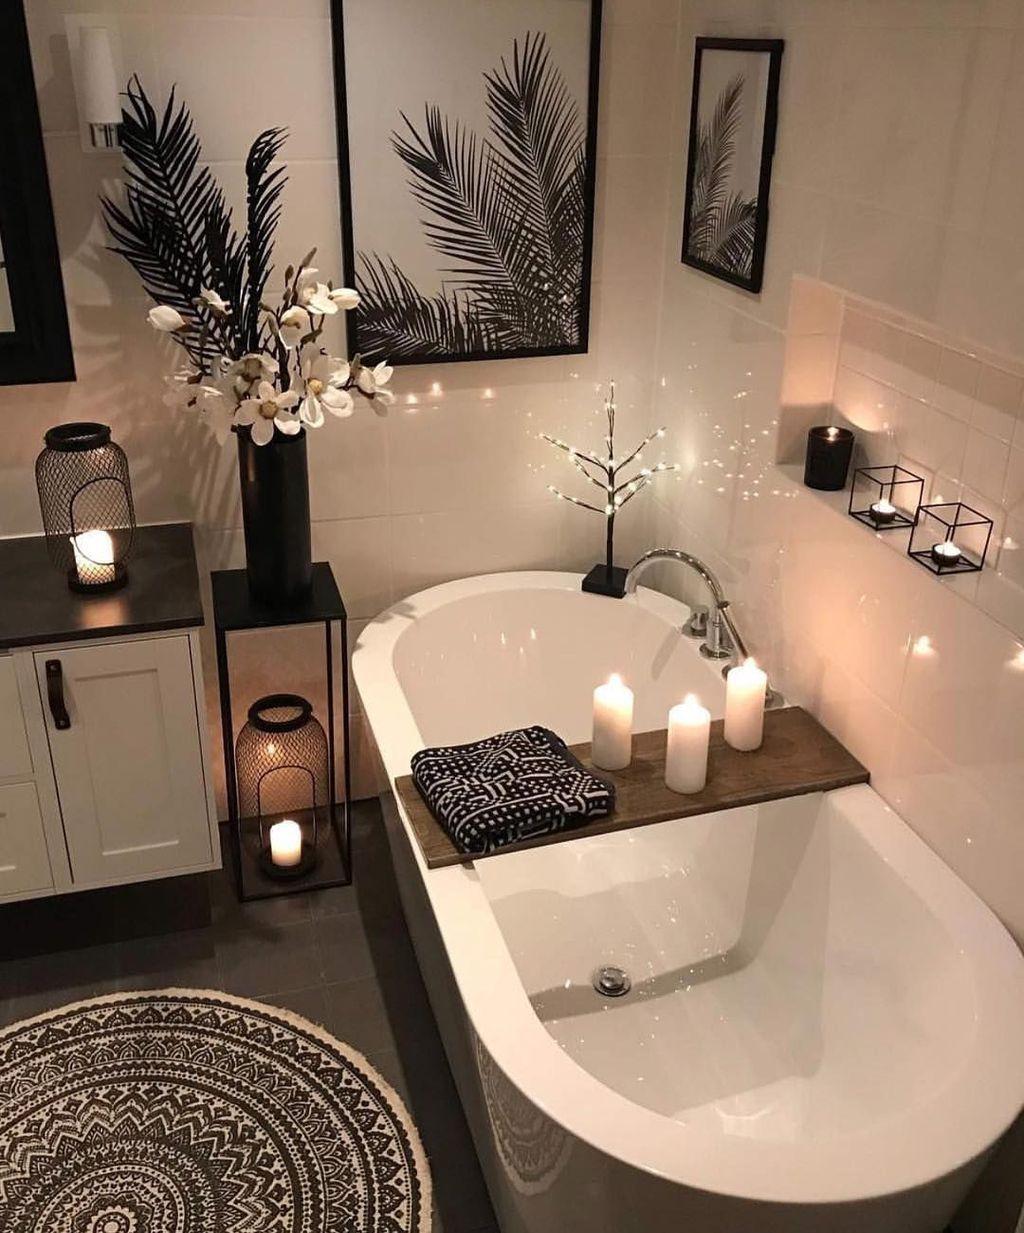 Adorable Contemporary Bathroom Ideas To Inspire 01 Jpg 1024 1233